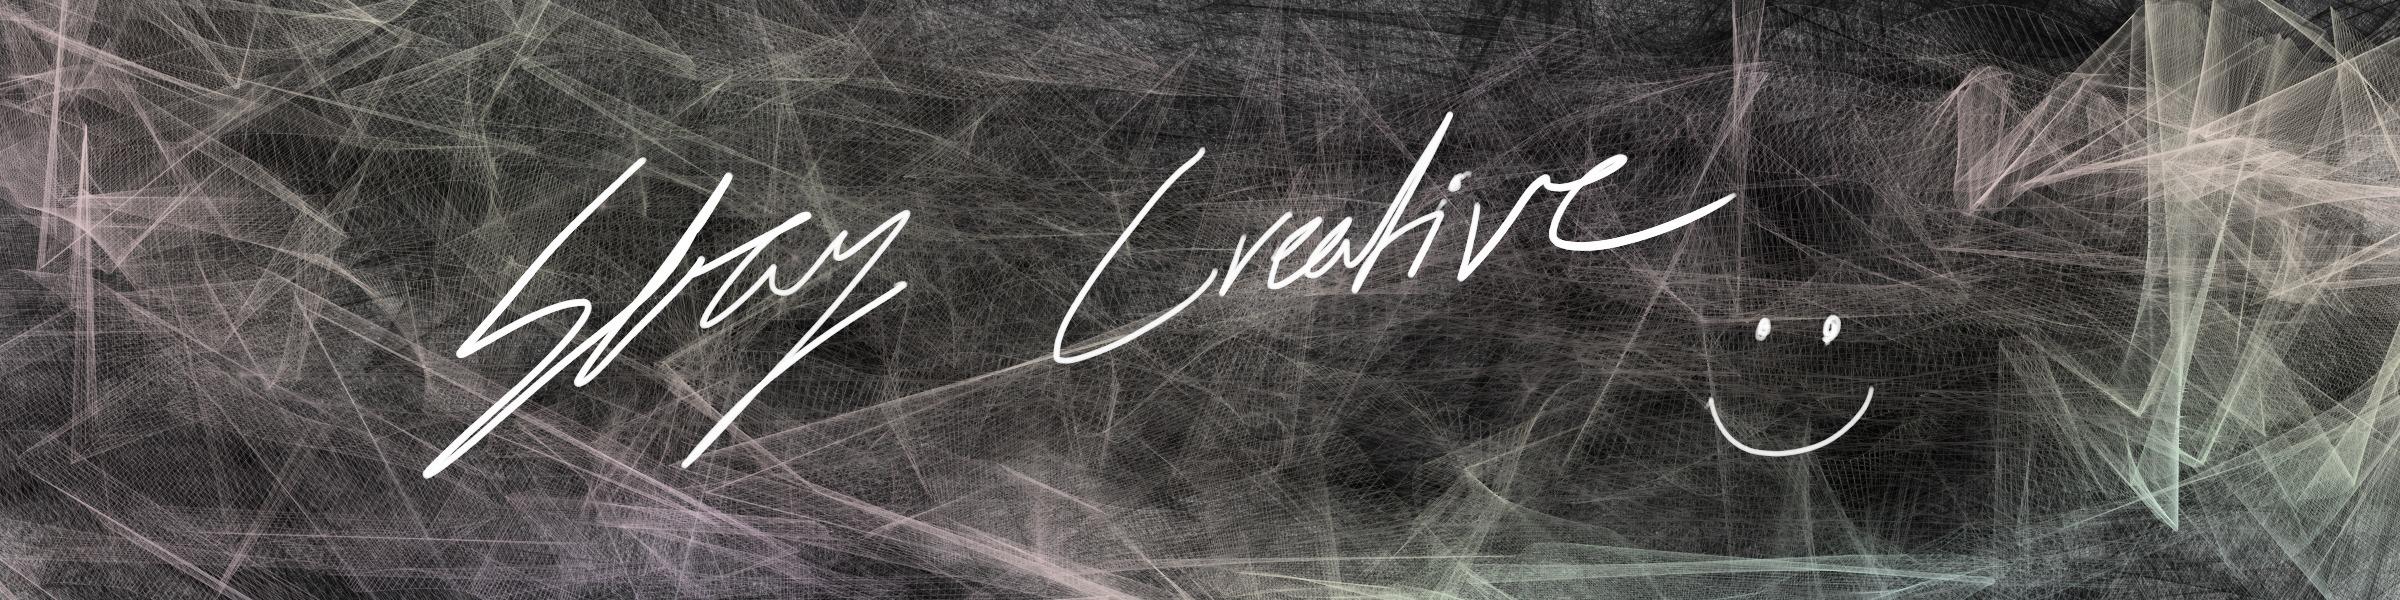 er (@artsymartini) Cover Image